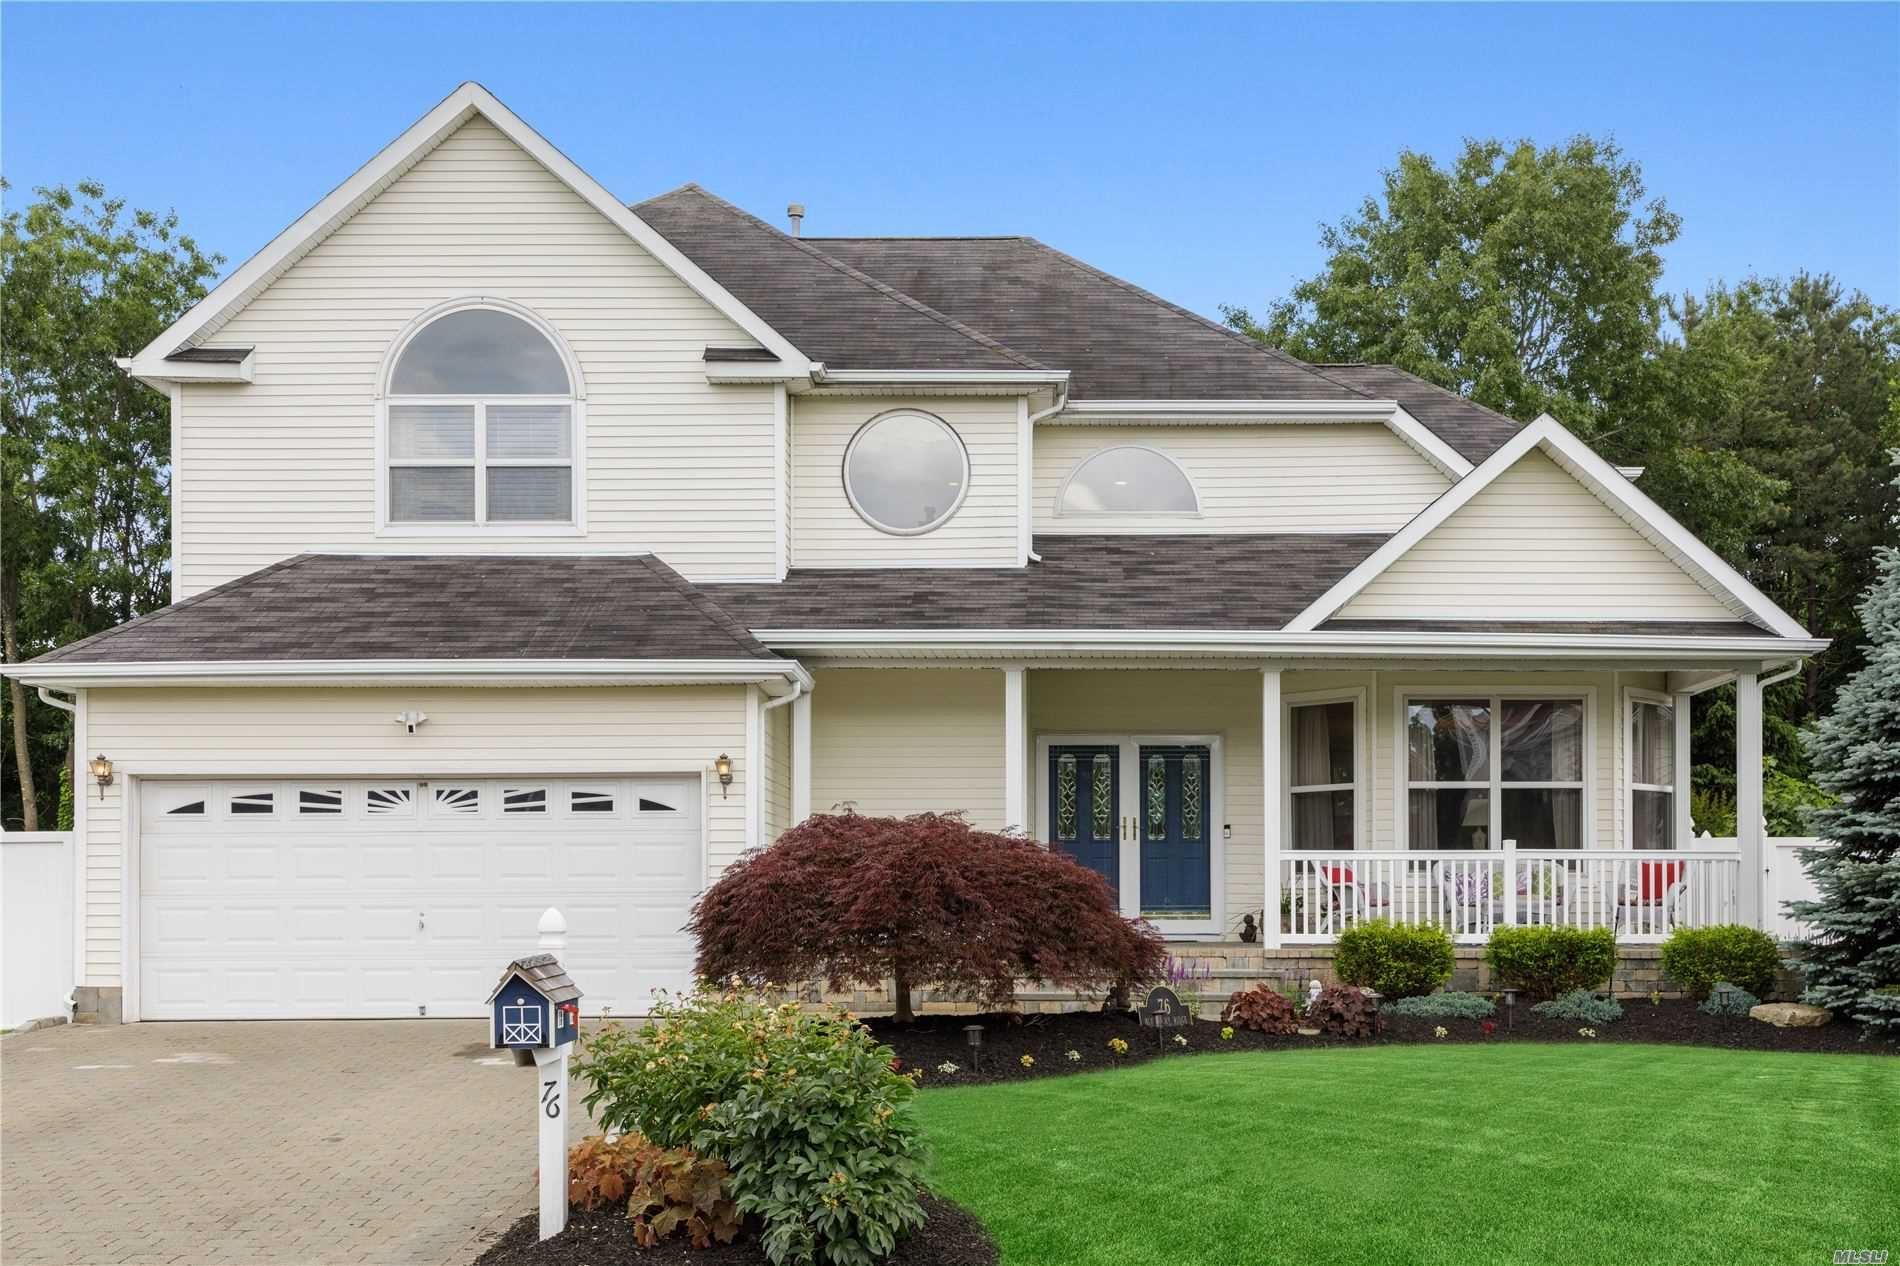 76 Blueberry Ridge Drive, Holtsville, NY 11742 - MLS#: 3226054